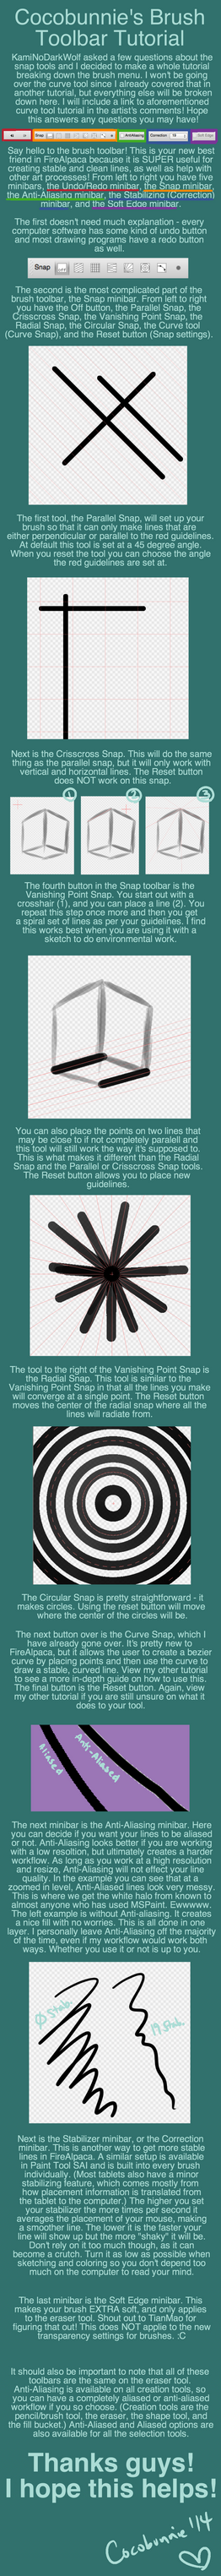 Tut: Brush Toolbar Breakdown (Updated!!) by cocobunnie